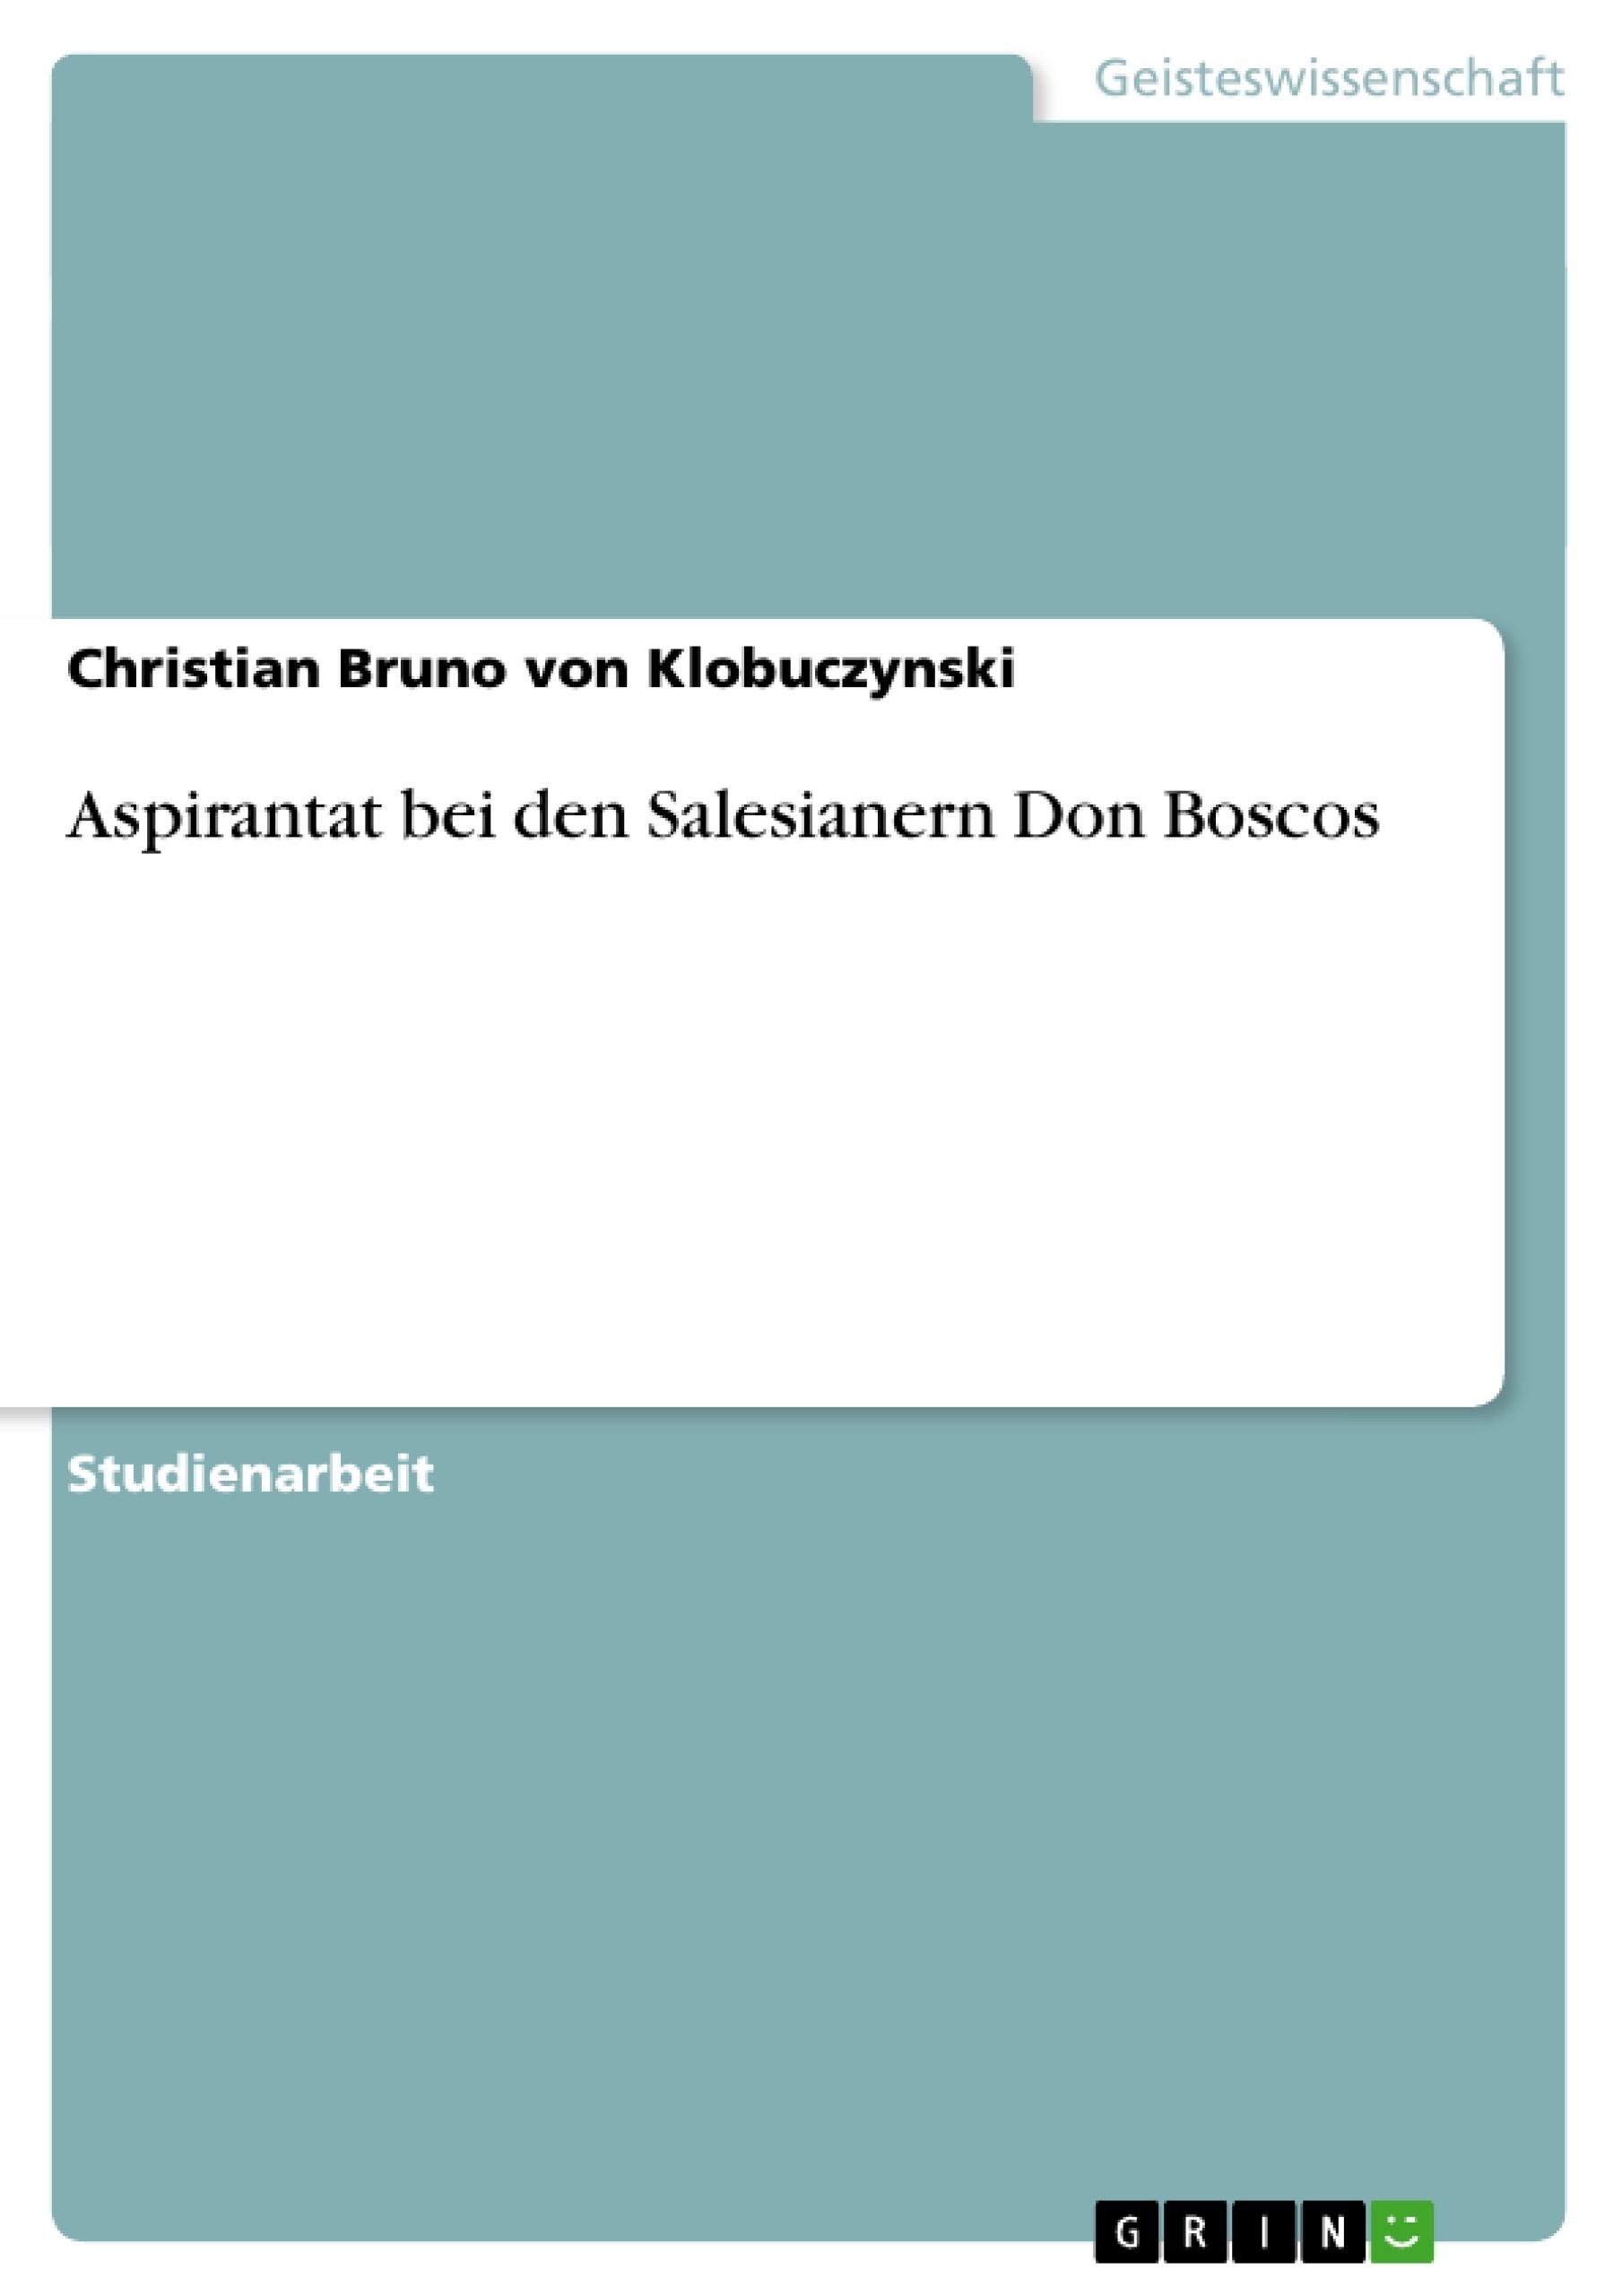 Titel: Aspirantat bei den Salesianern Don Boscos